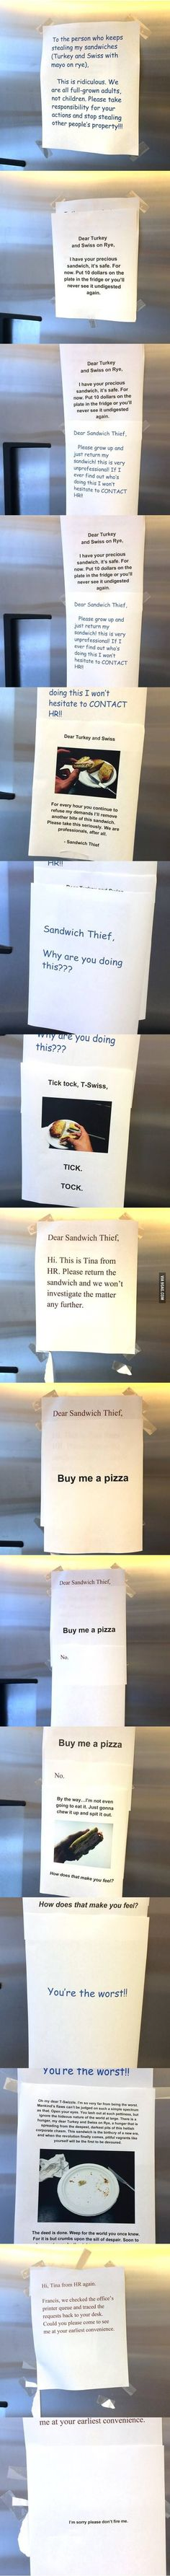 Epic!!!!!.....Sandwich Thief Stories